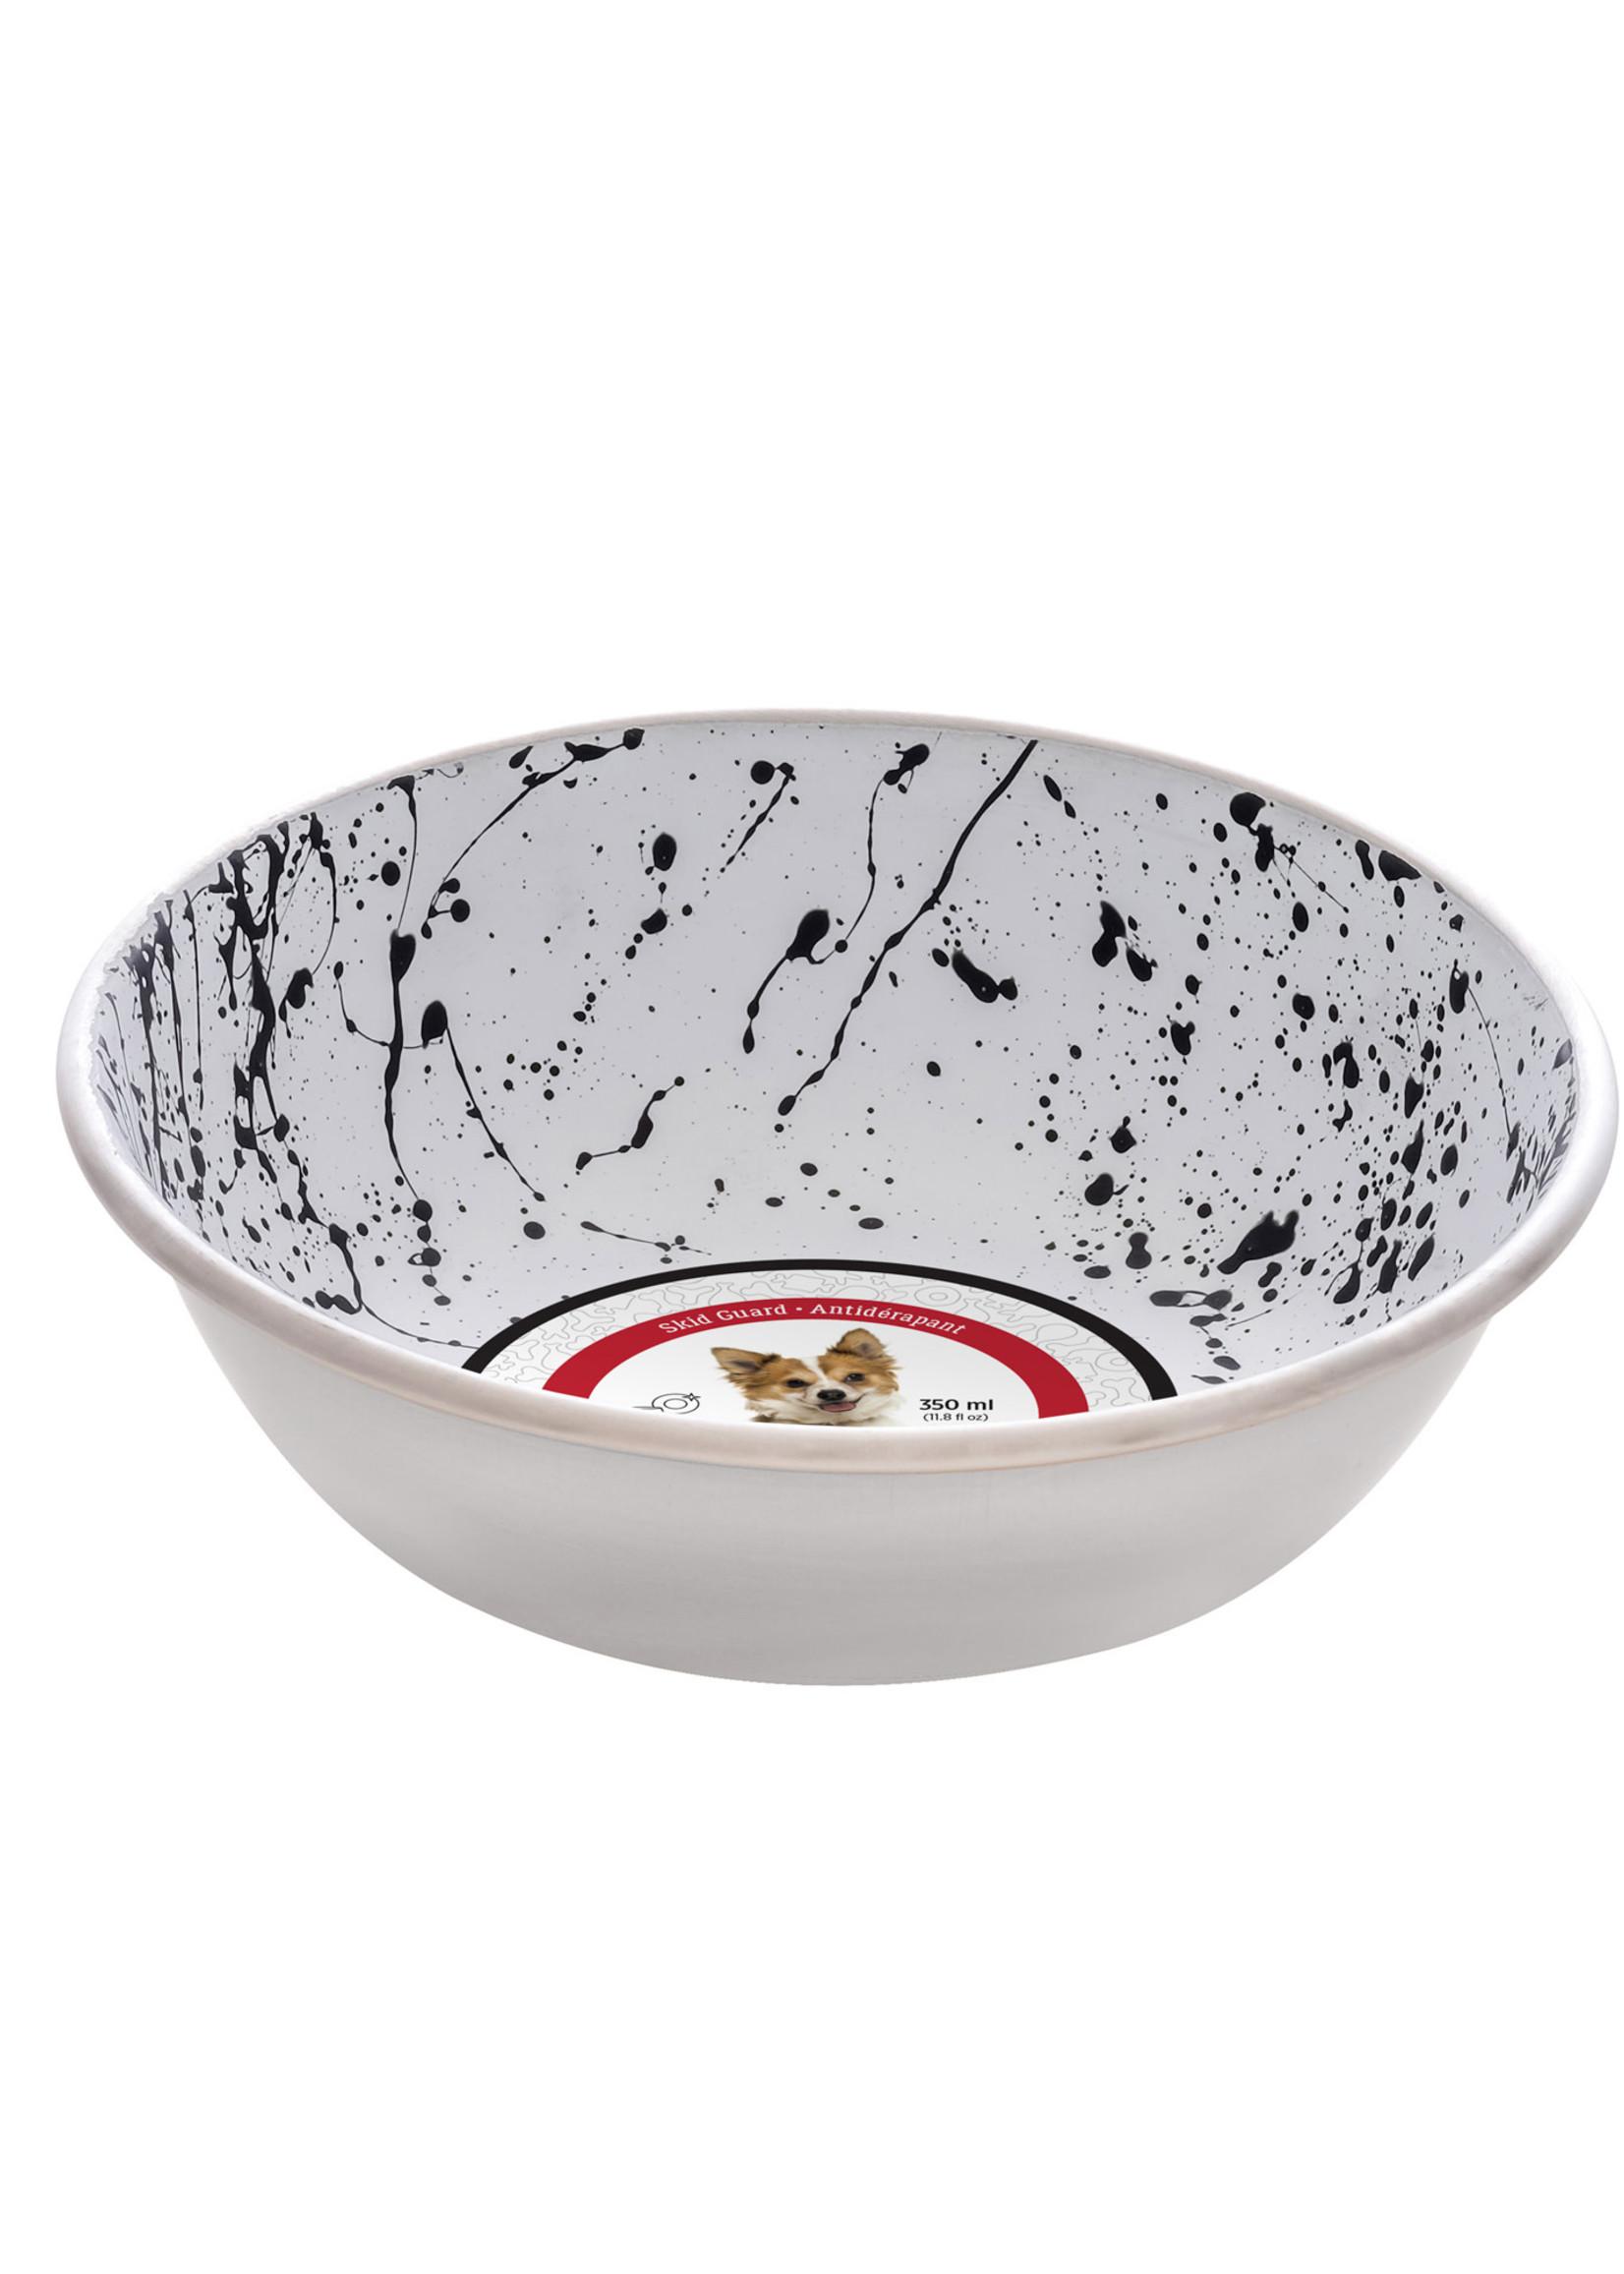 DogIt DO SS Bowl, Fashion Design,B&W,350ml